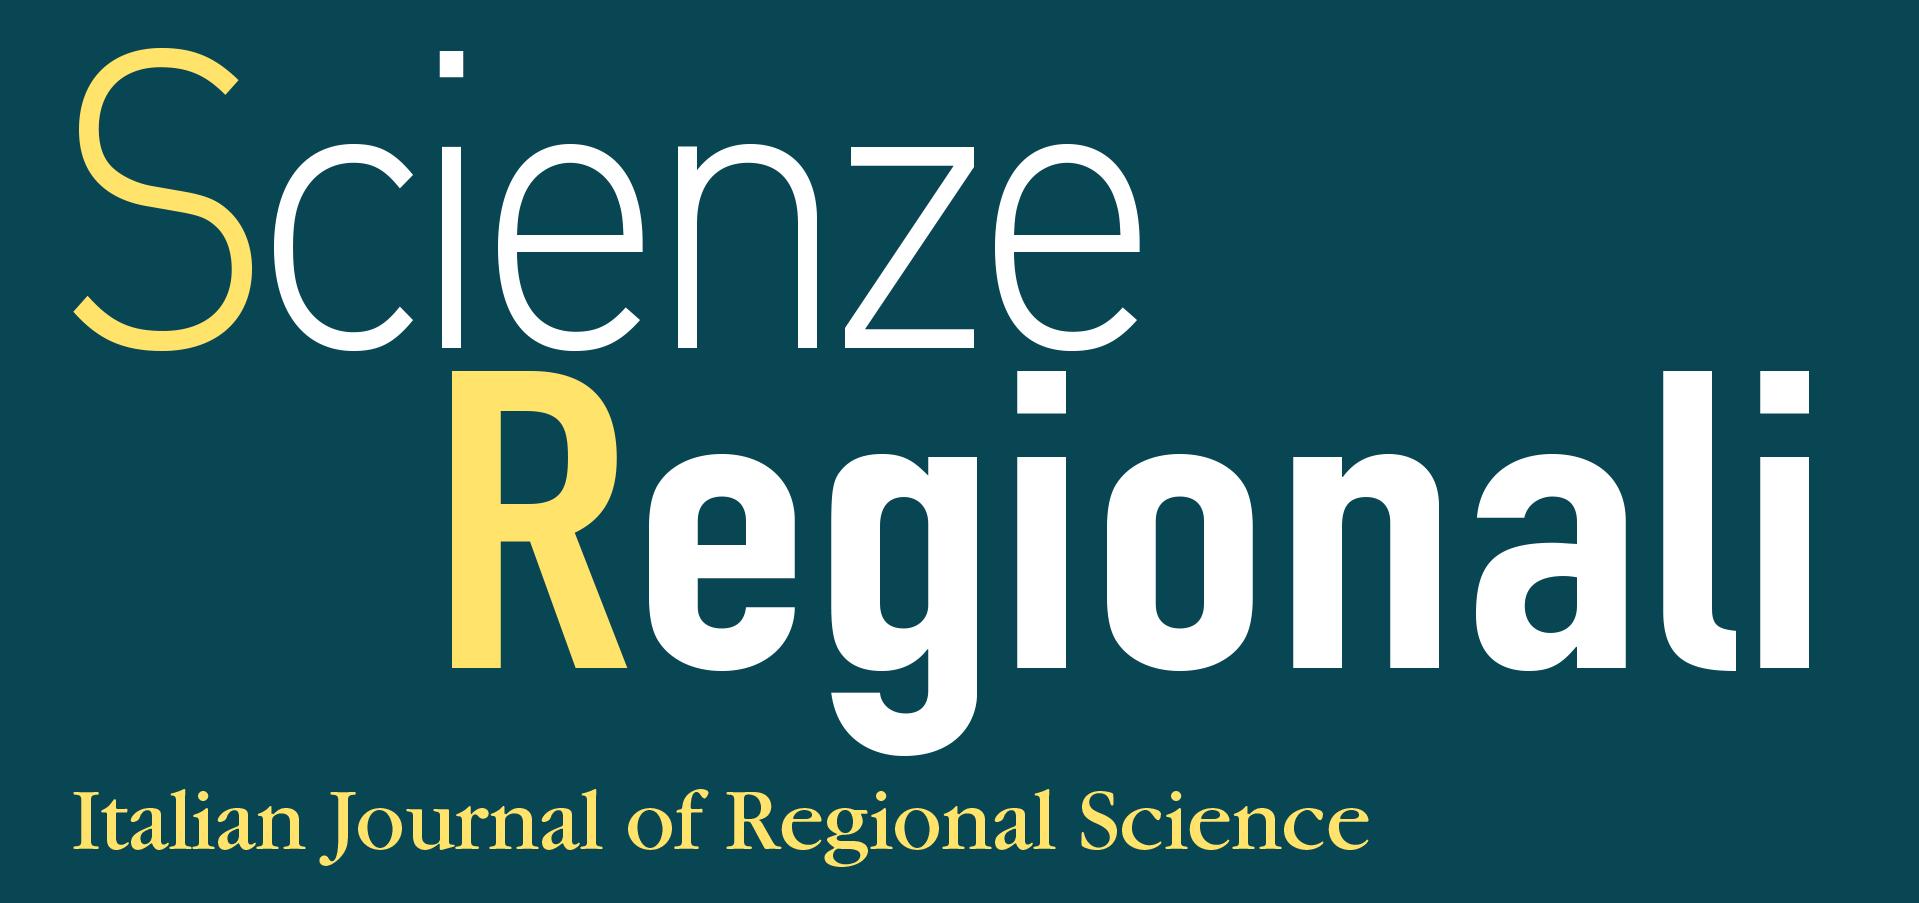 Scienze Regionali logo